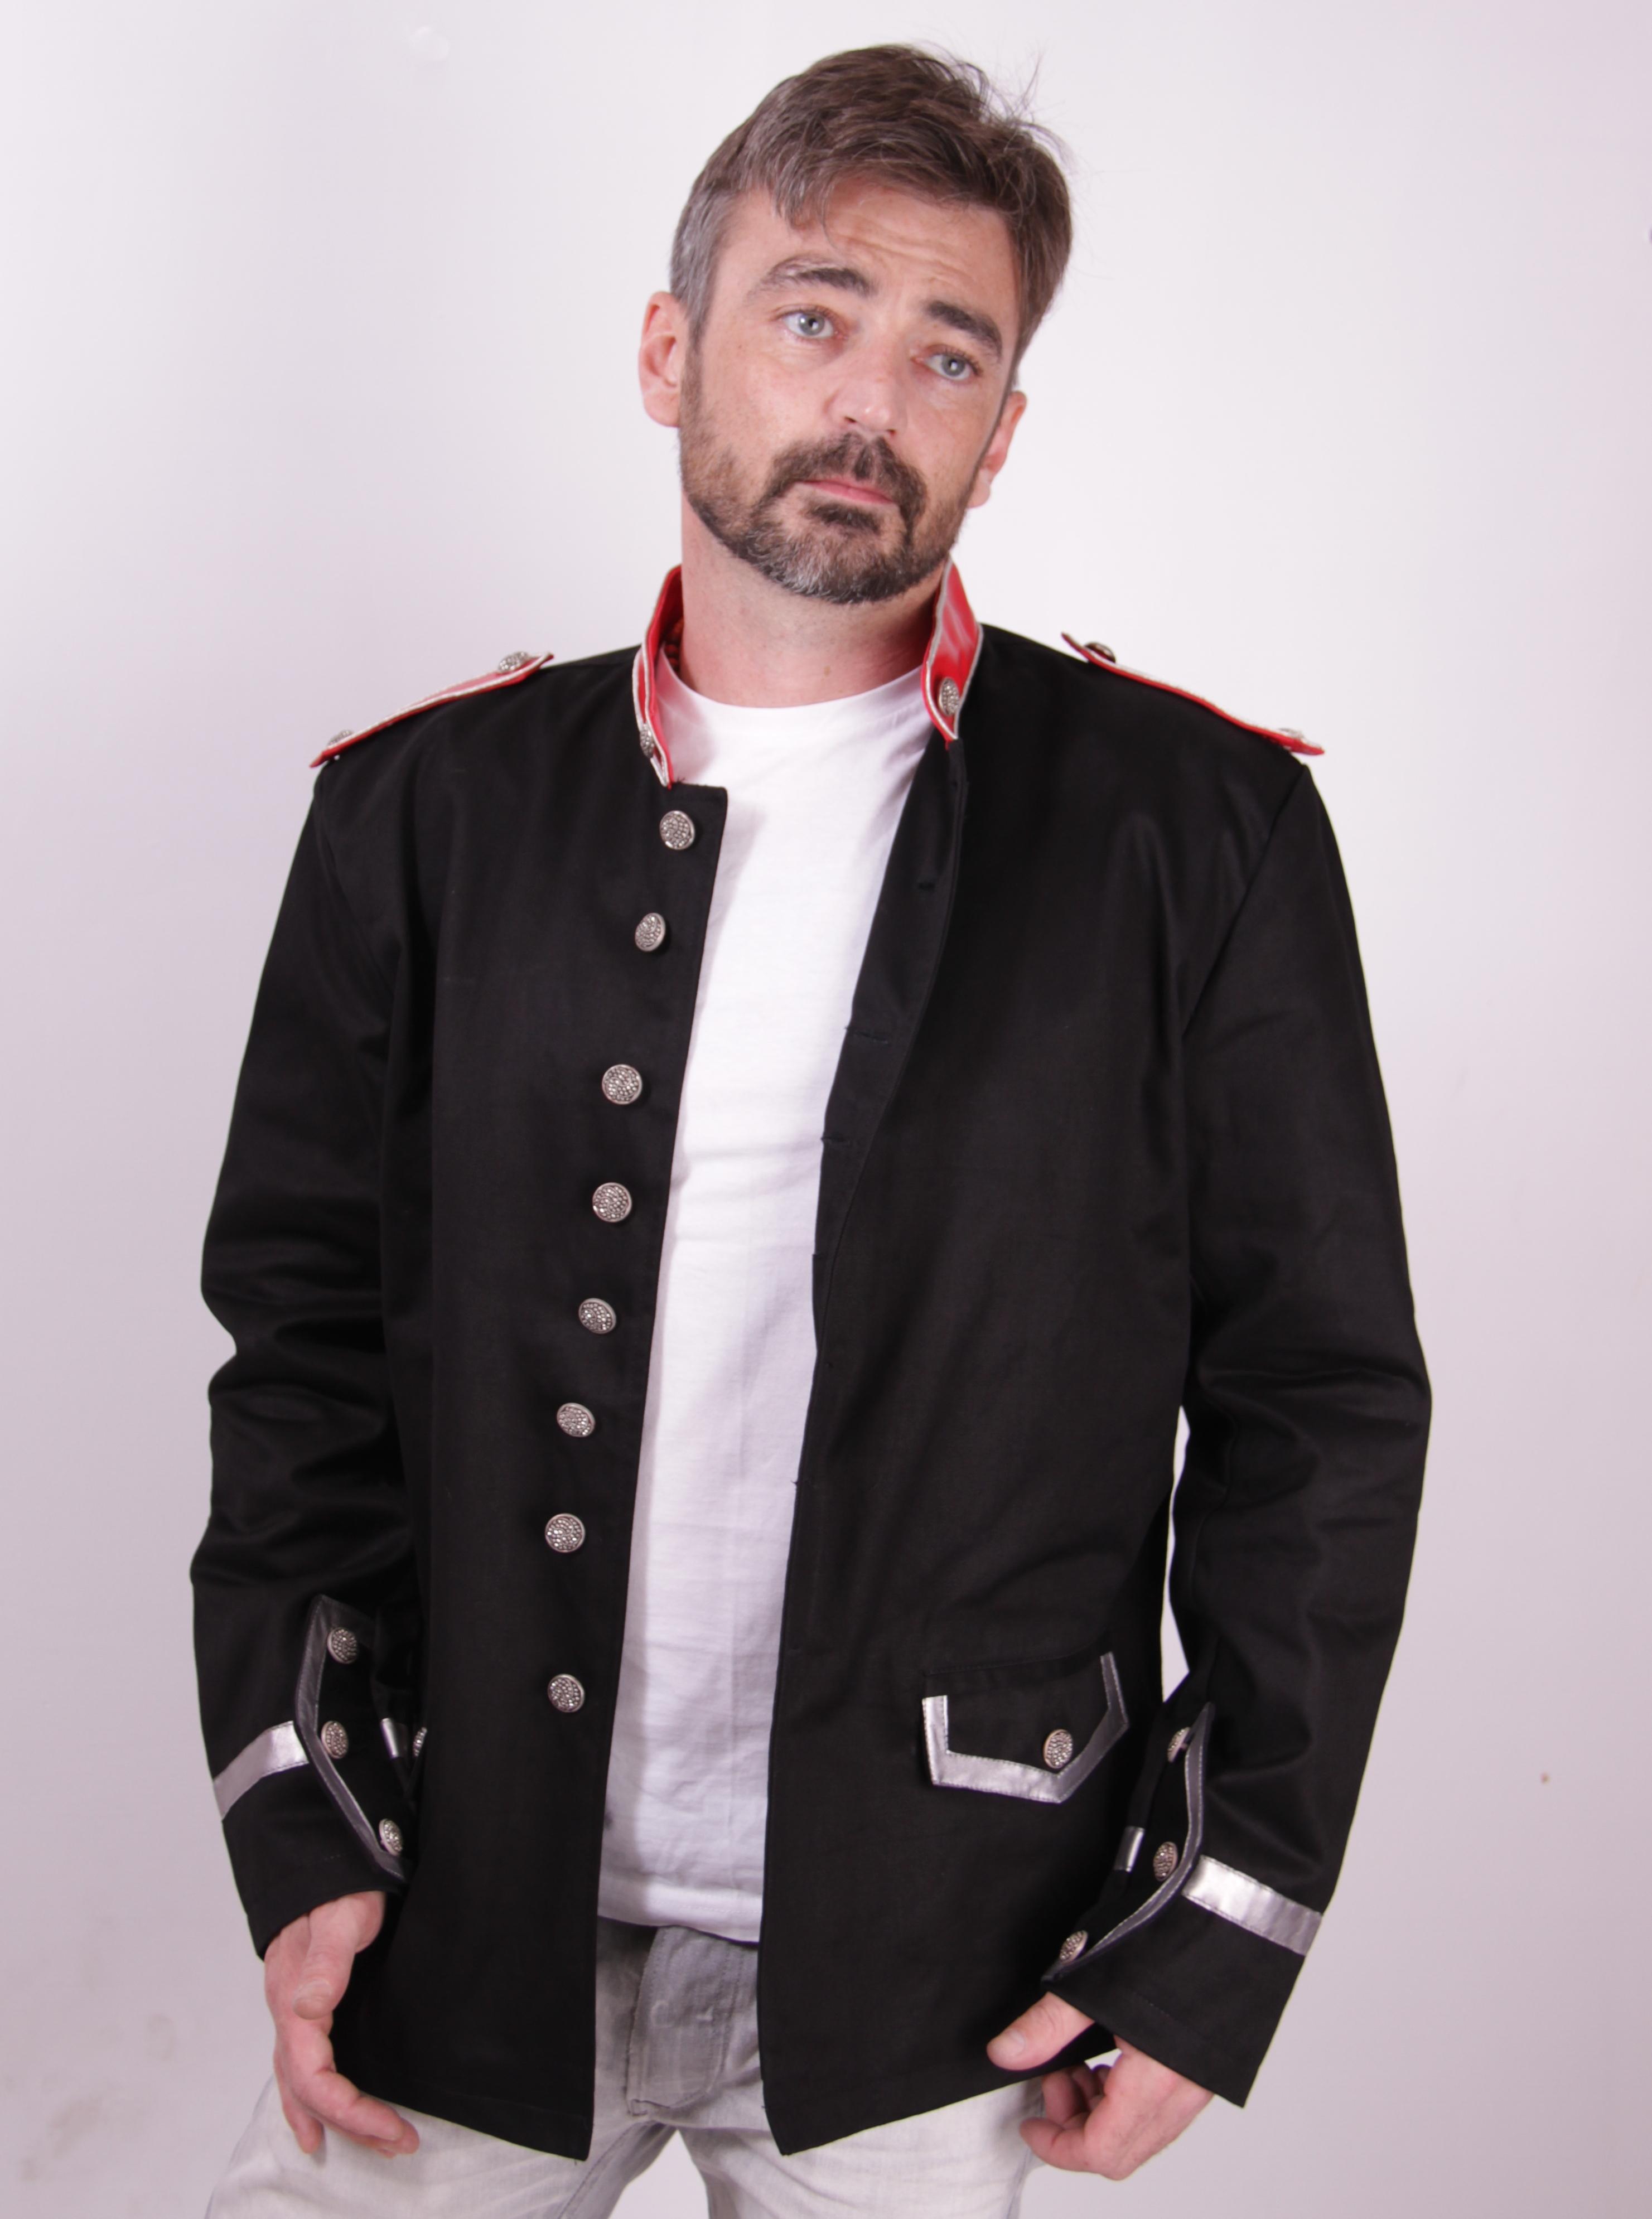 malik_guardsman_style_jacket_lady_ks_black_jackets_and_outerwear_2.JPG